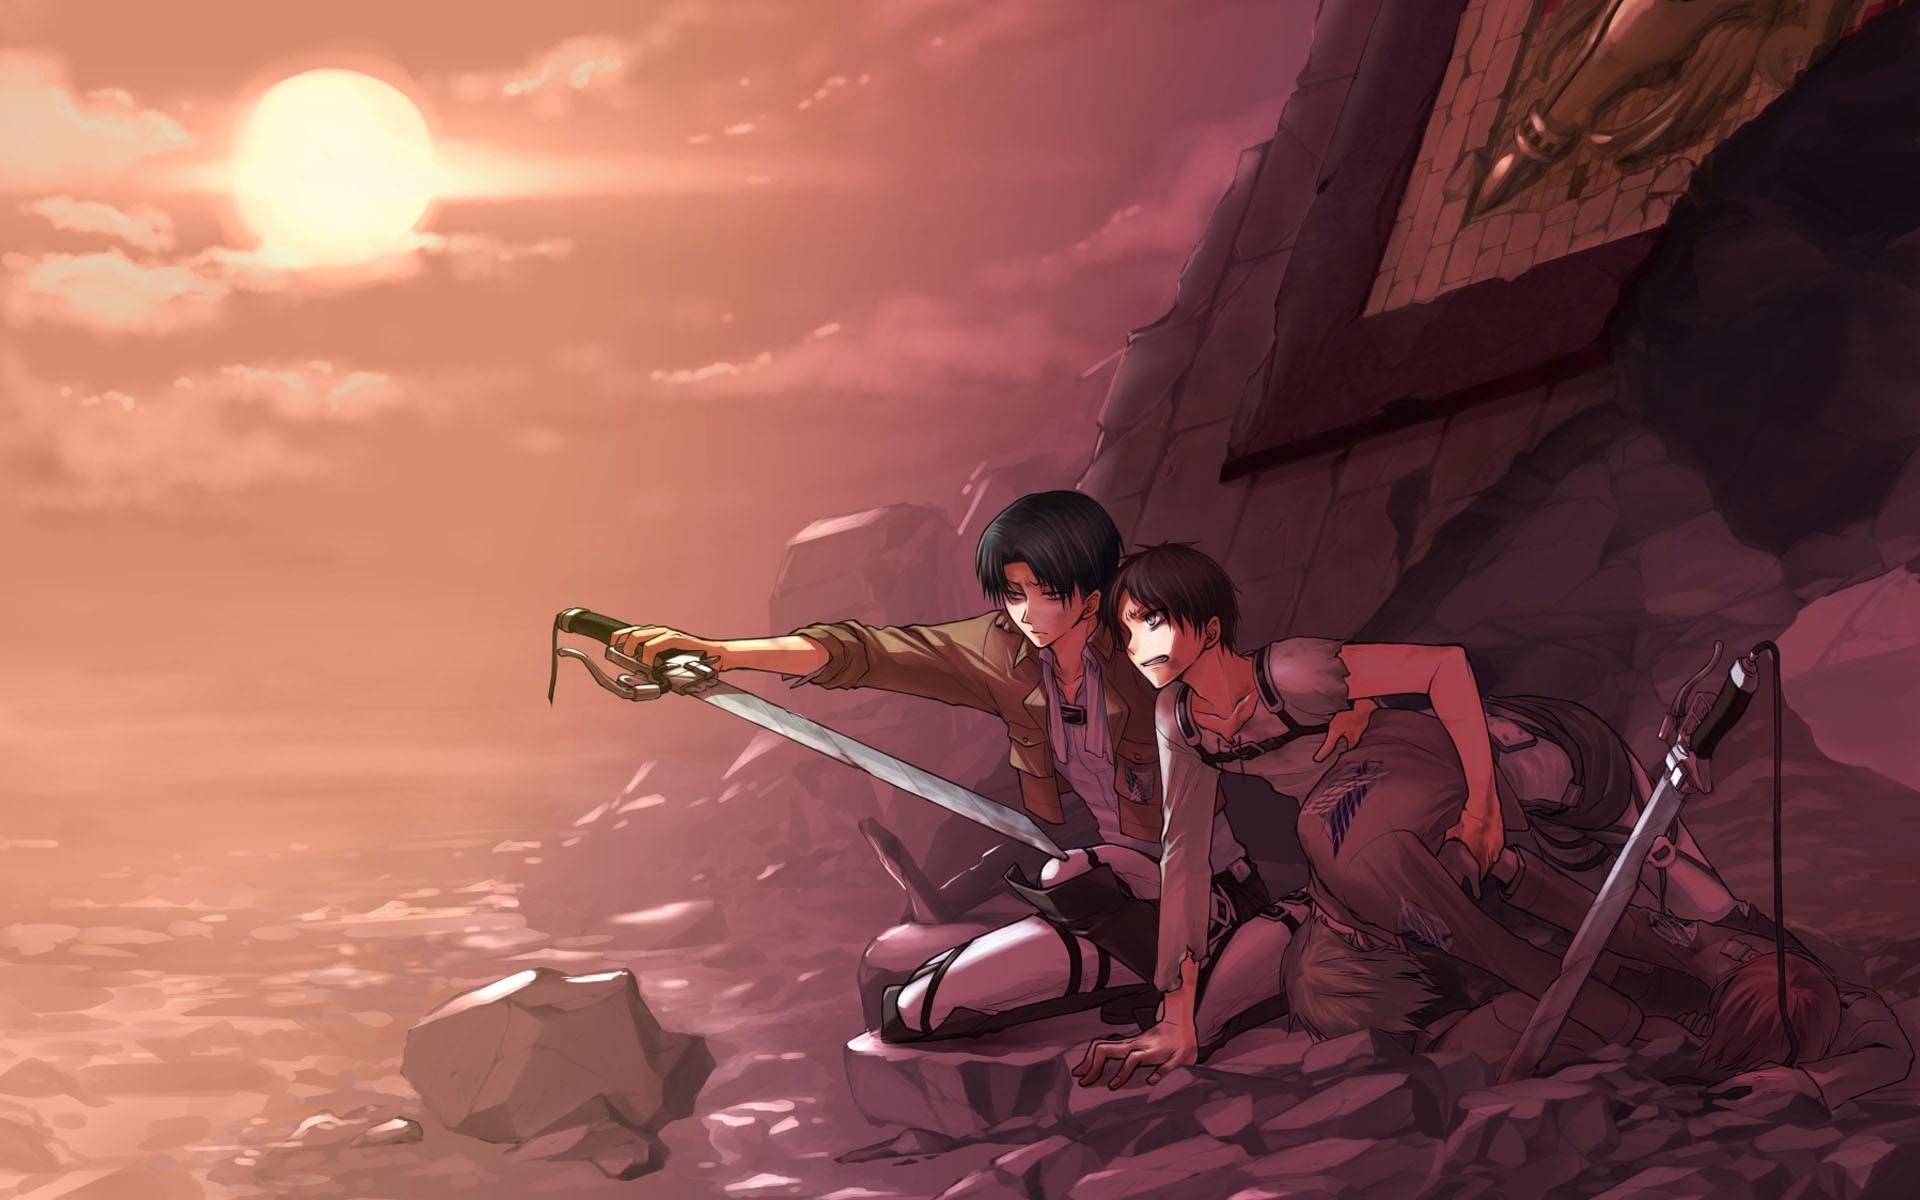 120 Attack On Titan Wallpaper Hd